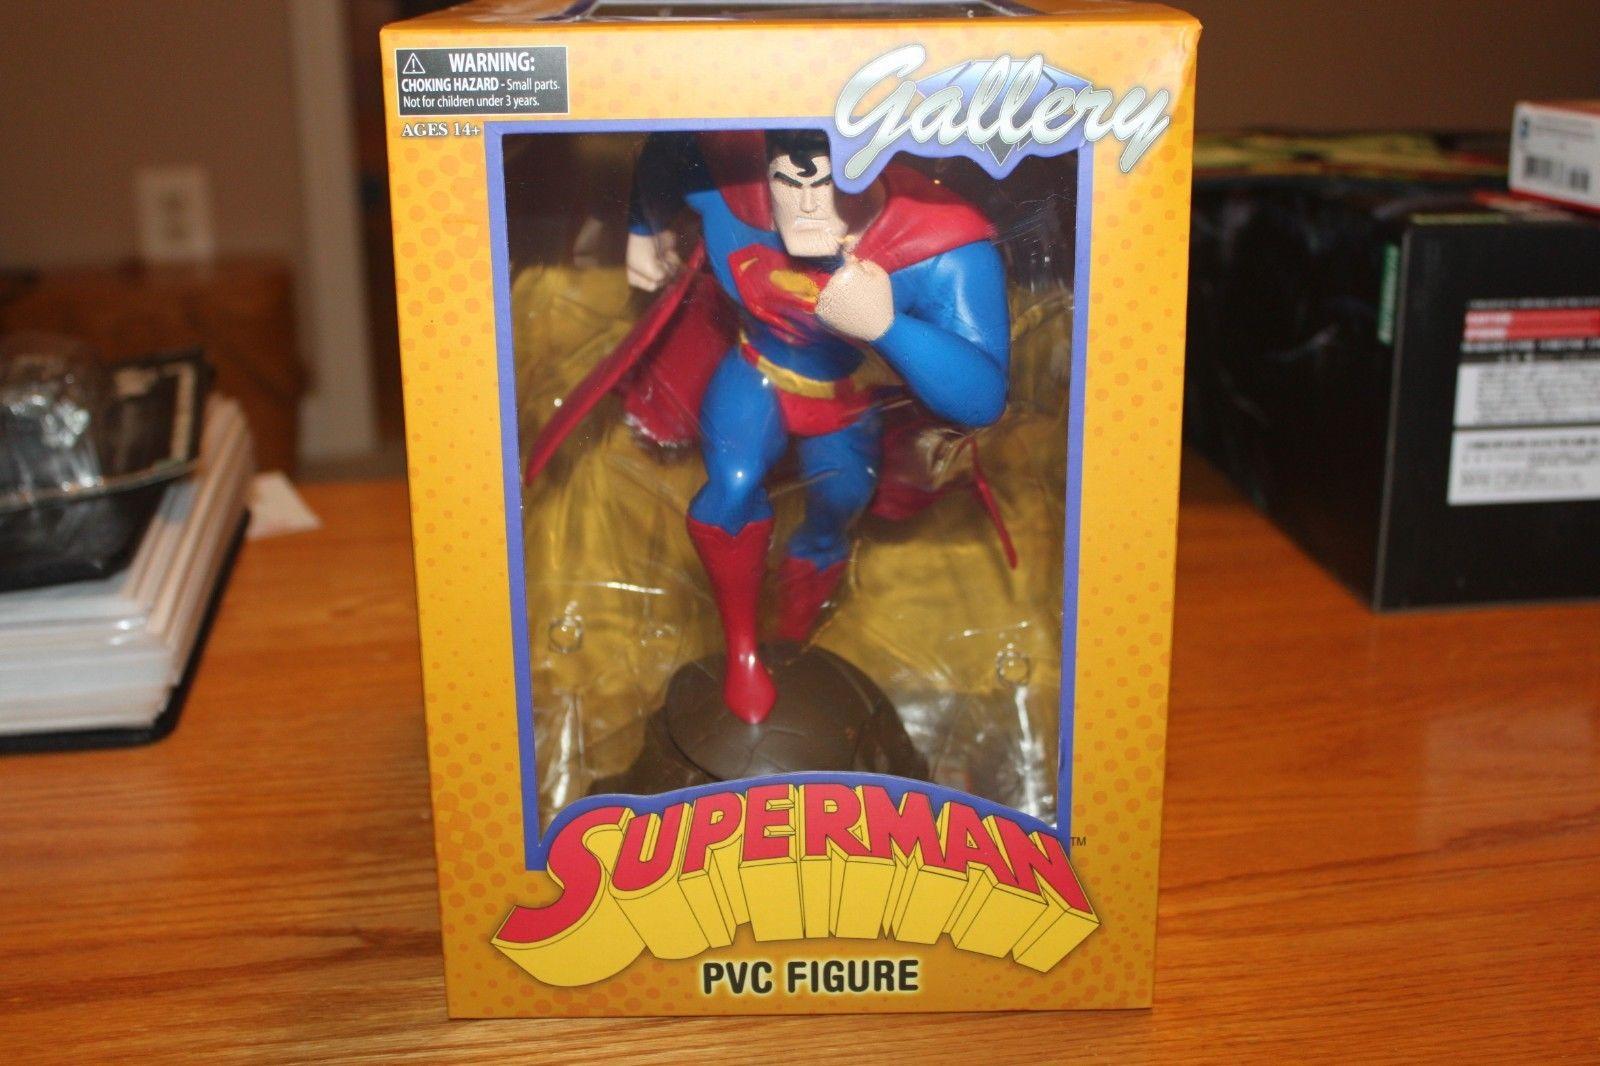 Animated Superman Gallery PVC Figure Statue - Diamond Select - NIB - Unopened